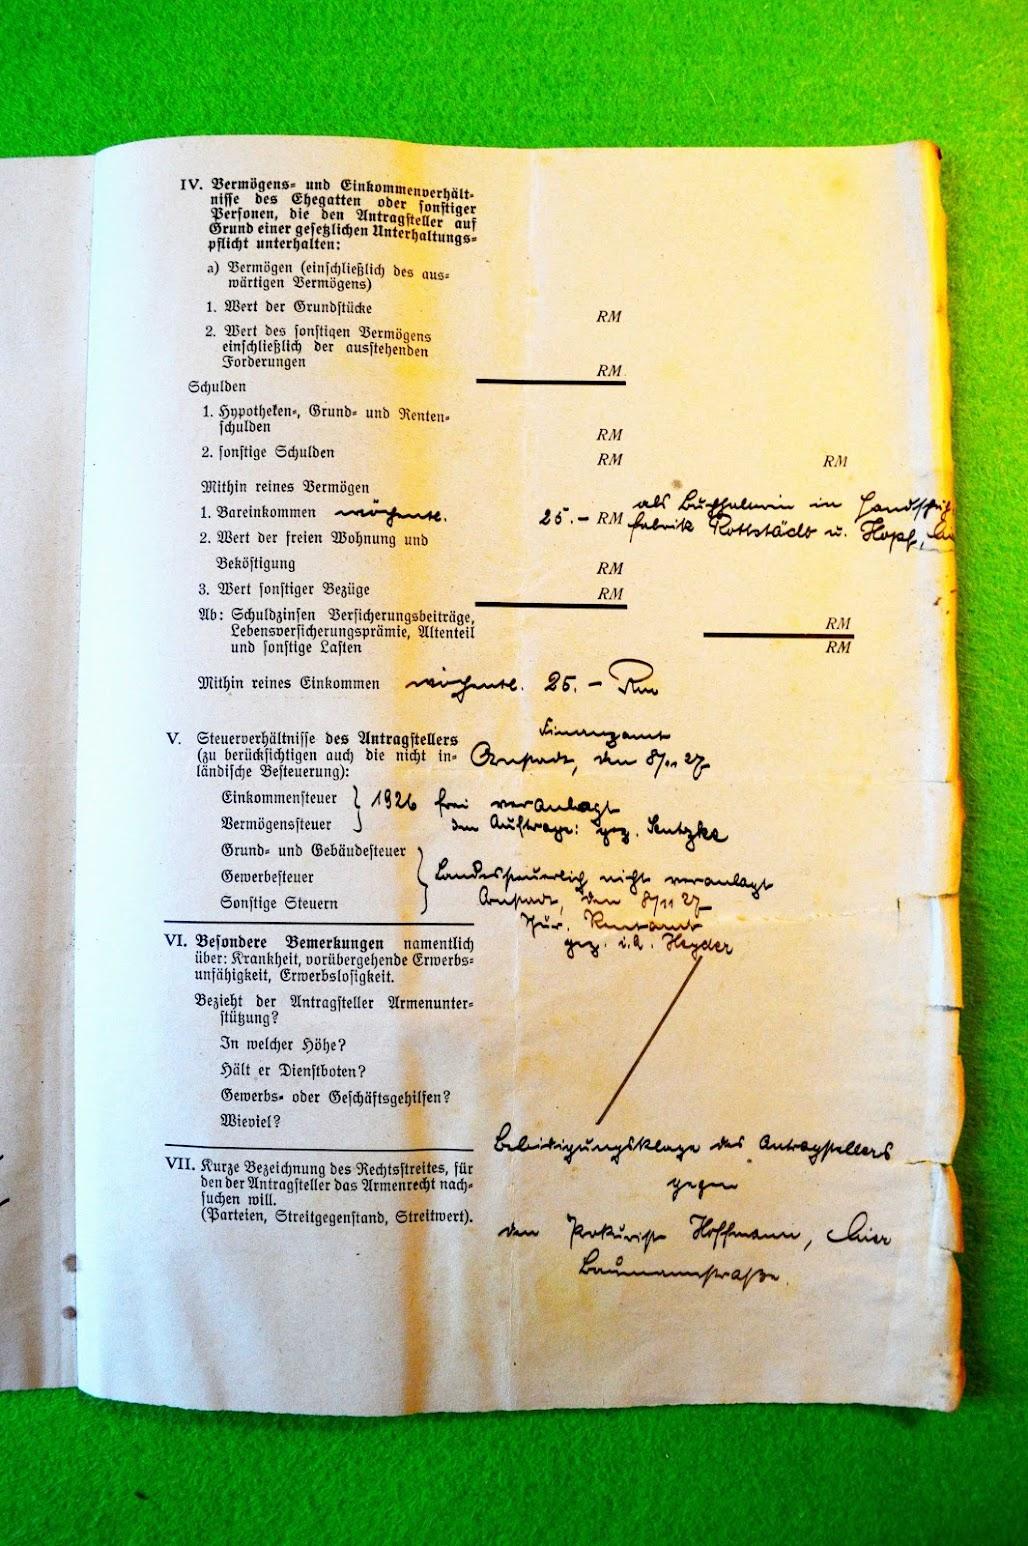 Armutszeugnis - Goldschmied Arthur Tresselt - Arnstadt - 8.11.1927